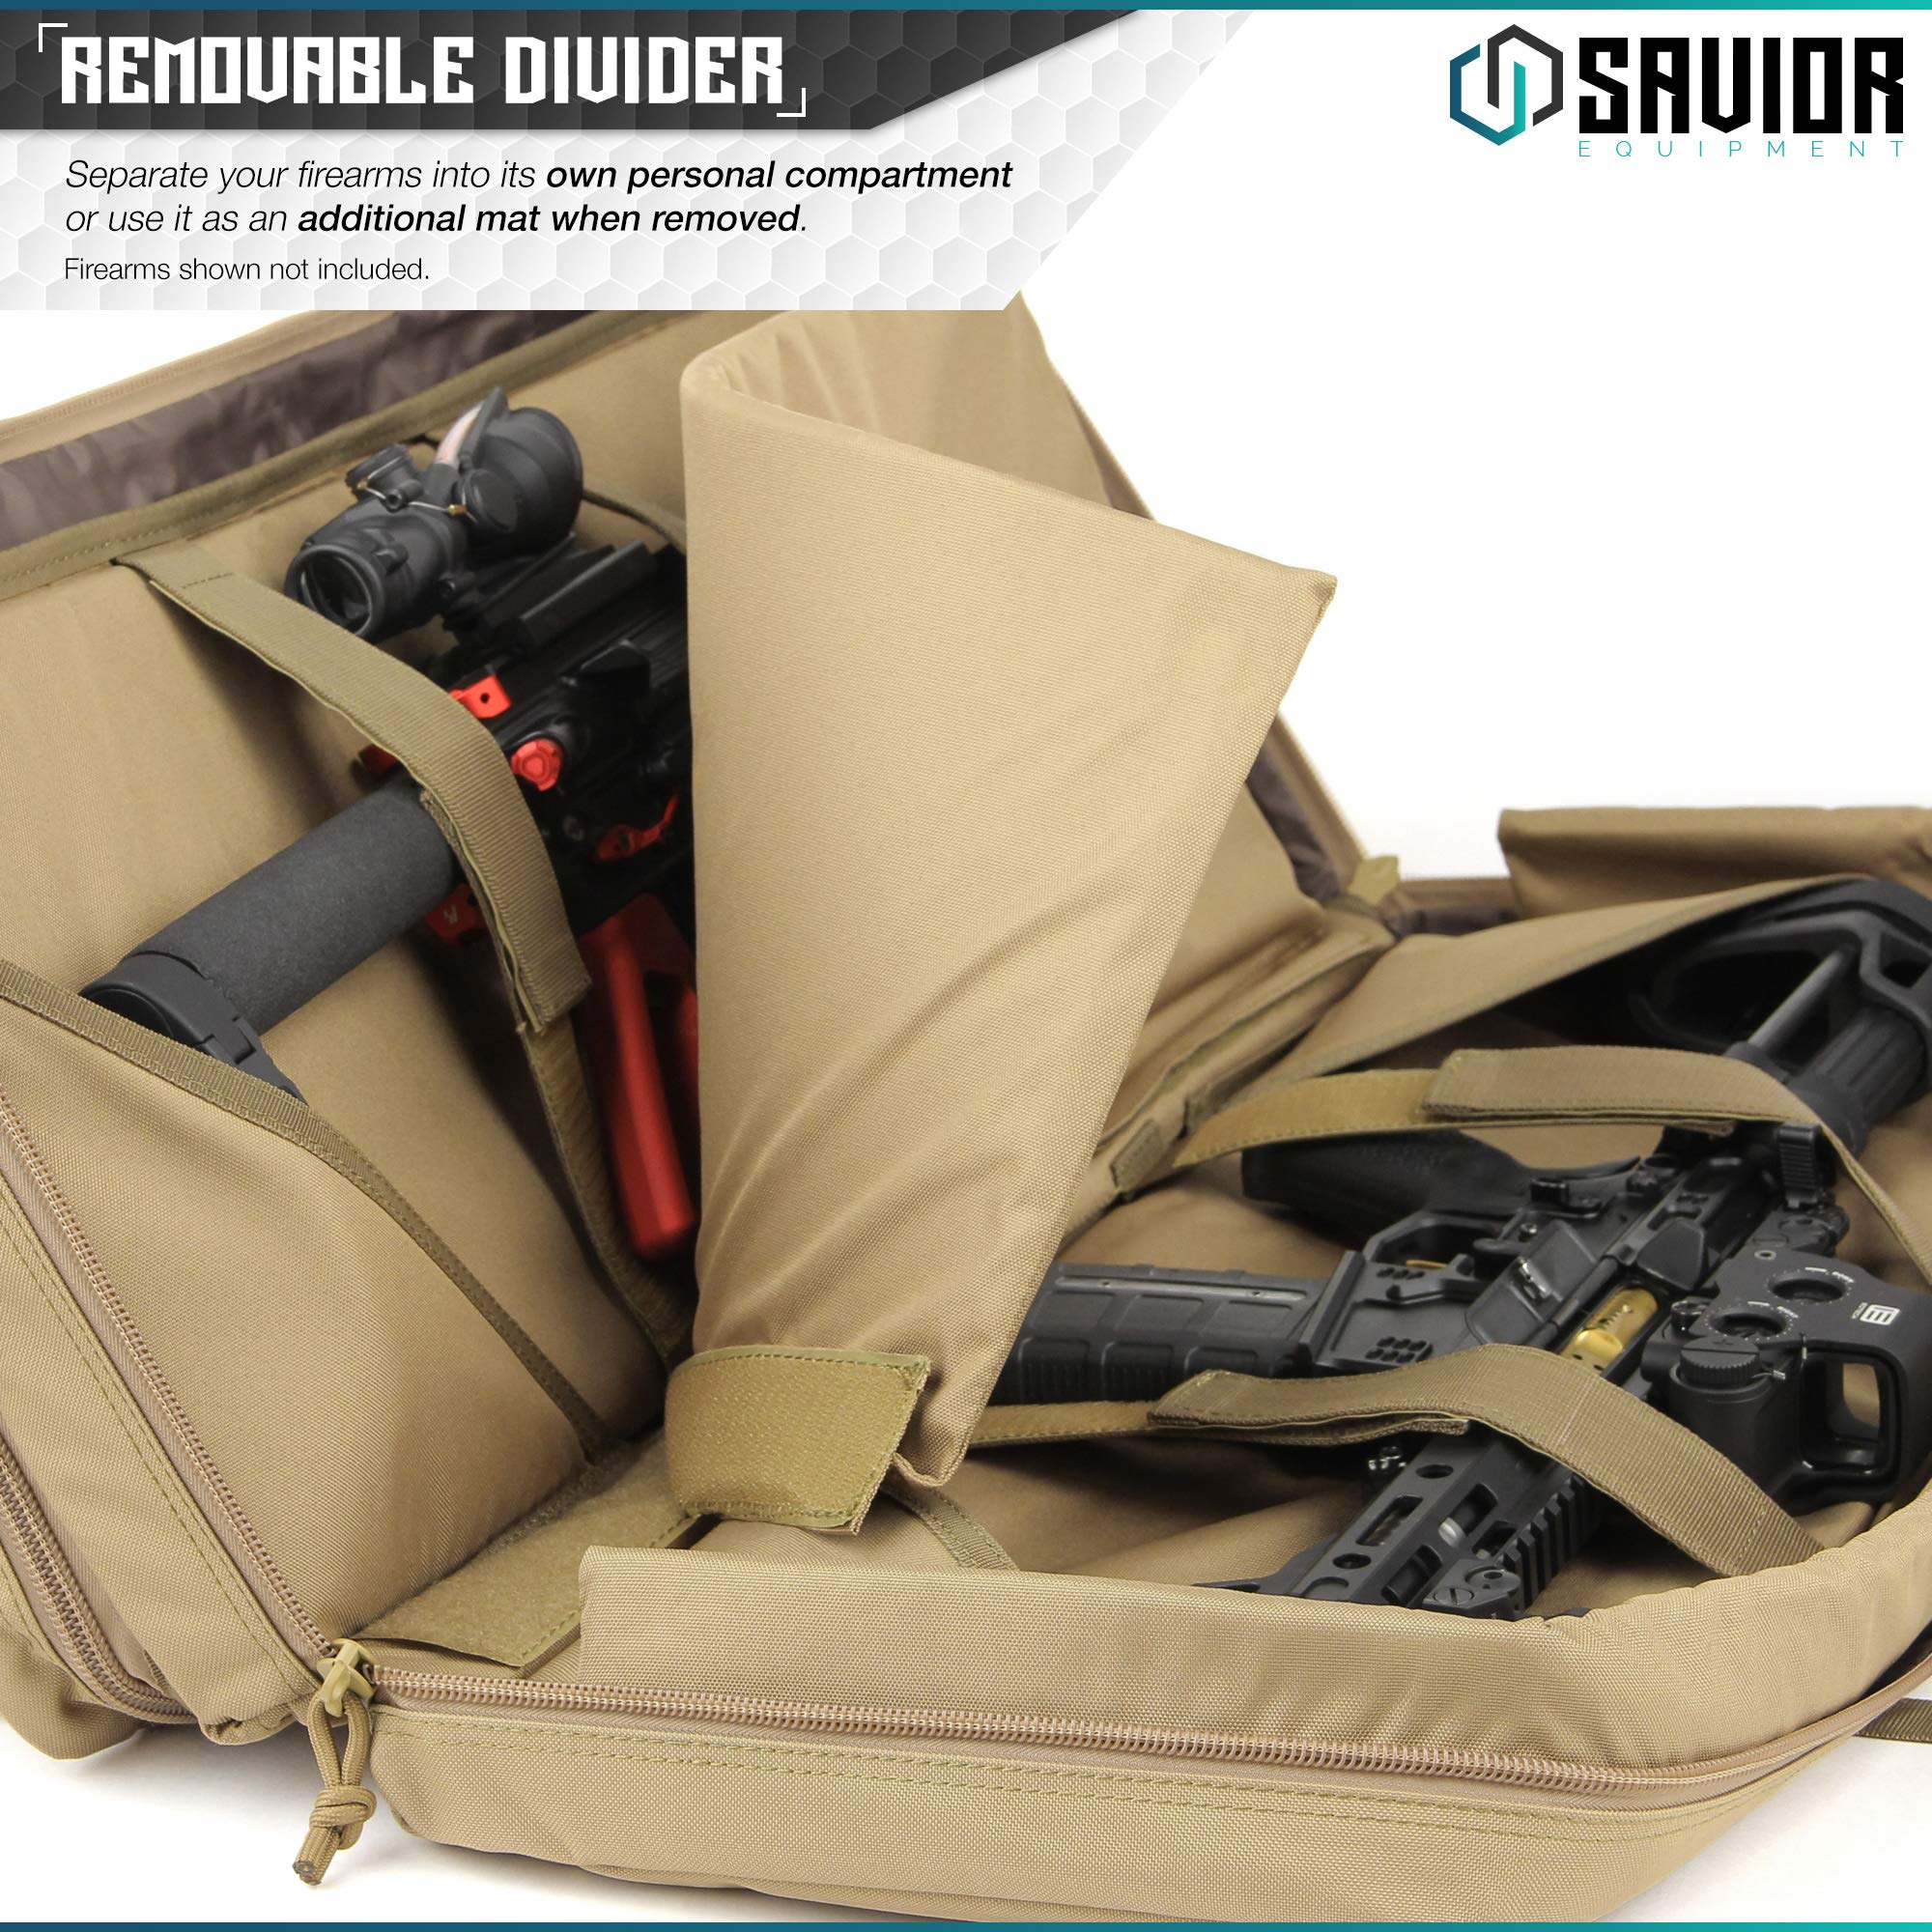 Savior Equipment American Classic Tactical Double Short Barrel Rifle Gun Case Firearm Bag - Suitable for Subgun Bullpups Carbine Shotgun SMG SBR AR AK Pistol, Available Length in 24'' 28'' 32'' by Savior Equipment (Image #3)